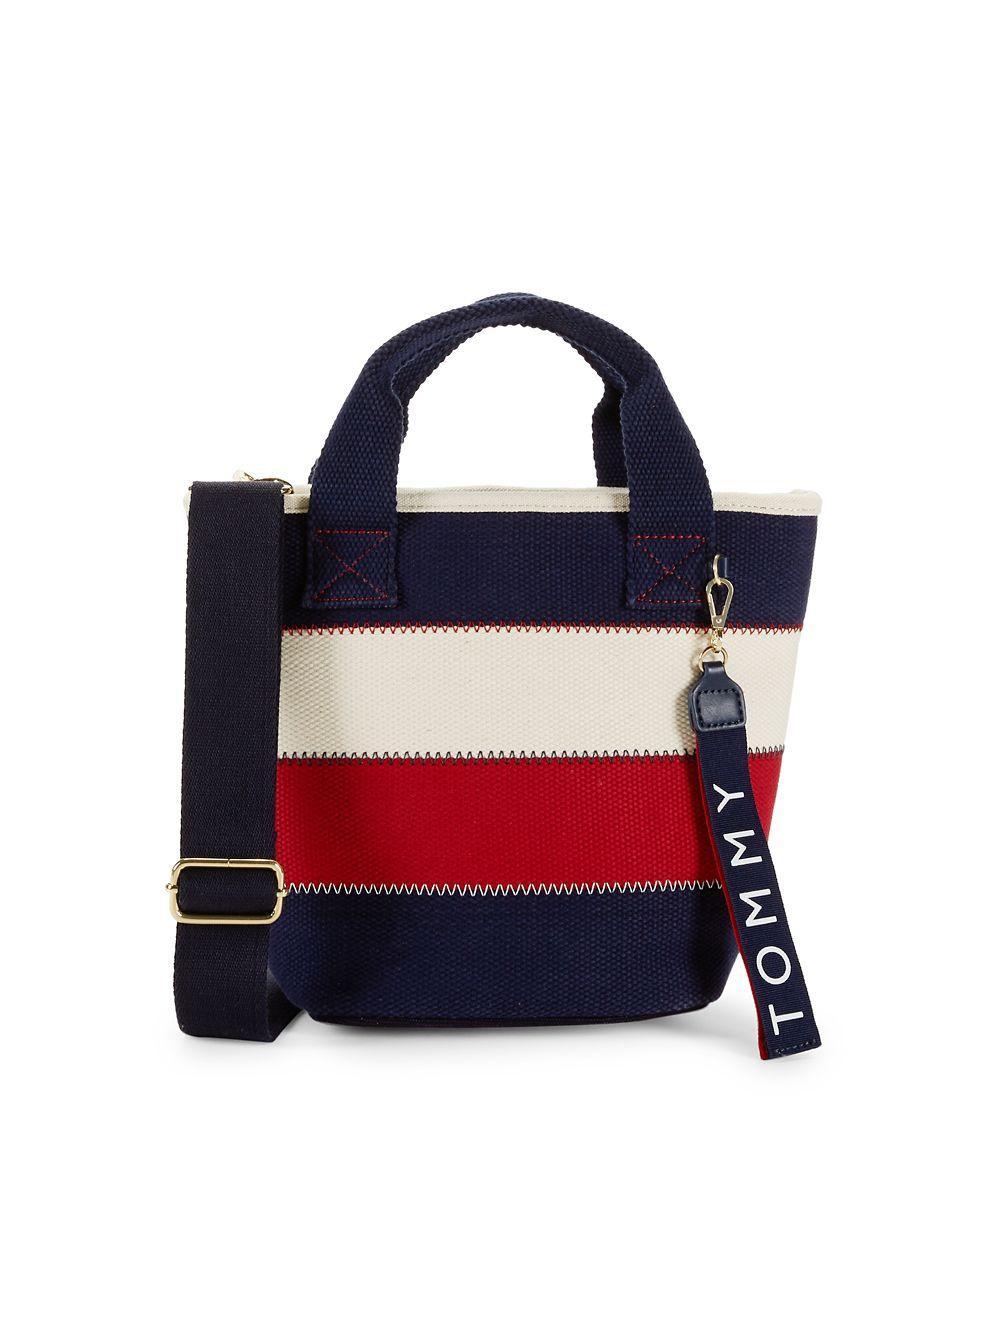 a9fb10856f6 Lyst - Tommy Hilfiger Vivian Cotton Crossbody Bag in Blue